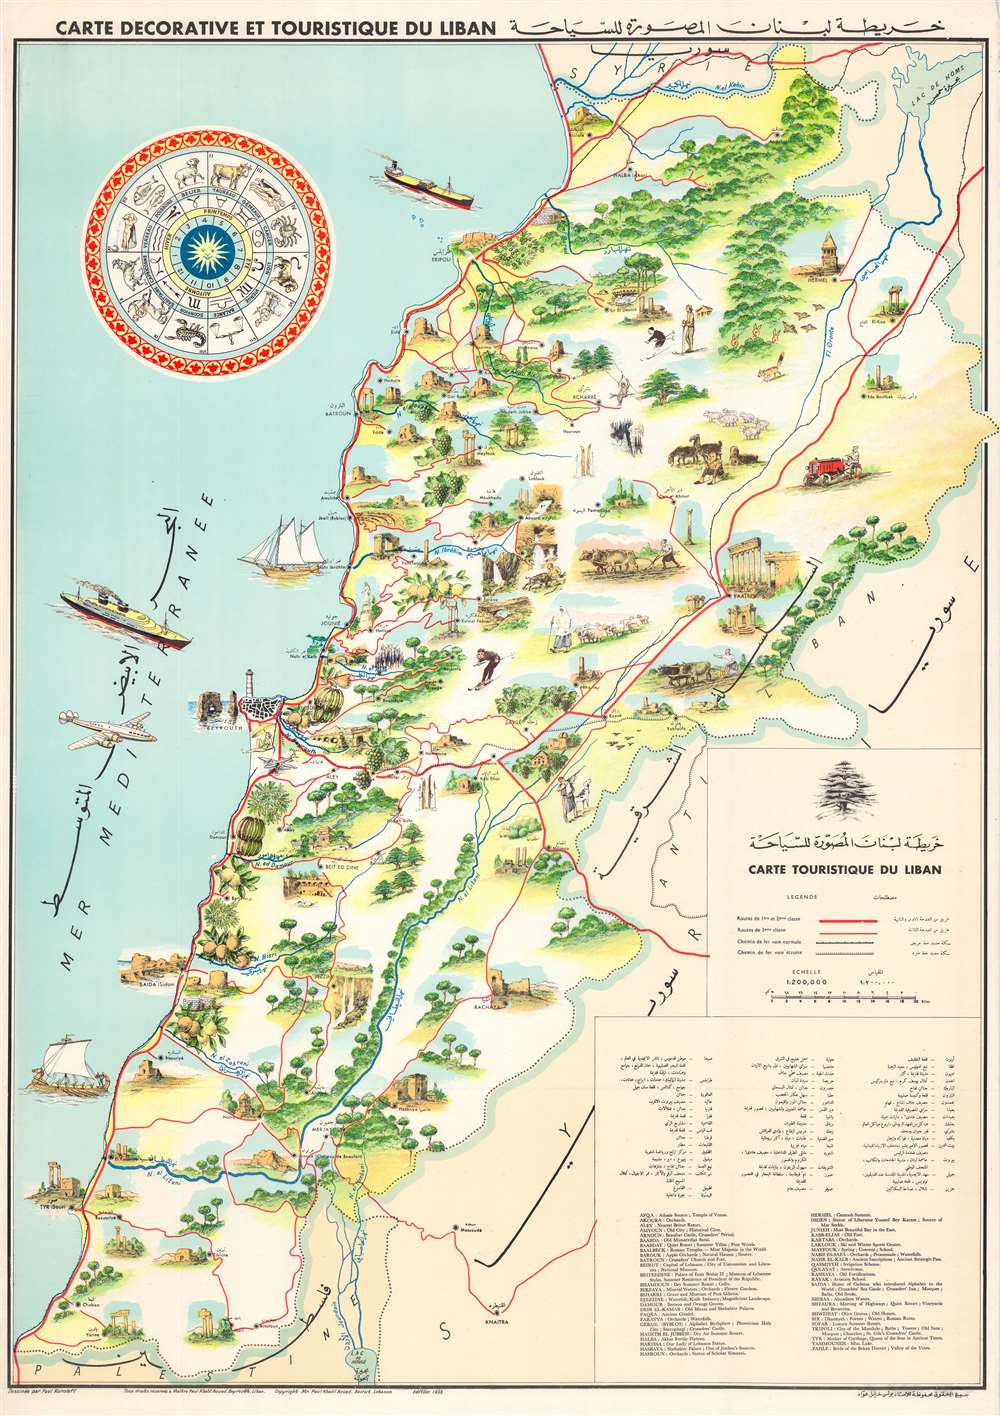 Carte Decorative et Touristique du Liban. خريطة لبنان المصورة للسياحة - Main View